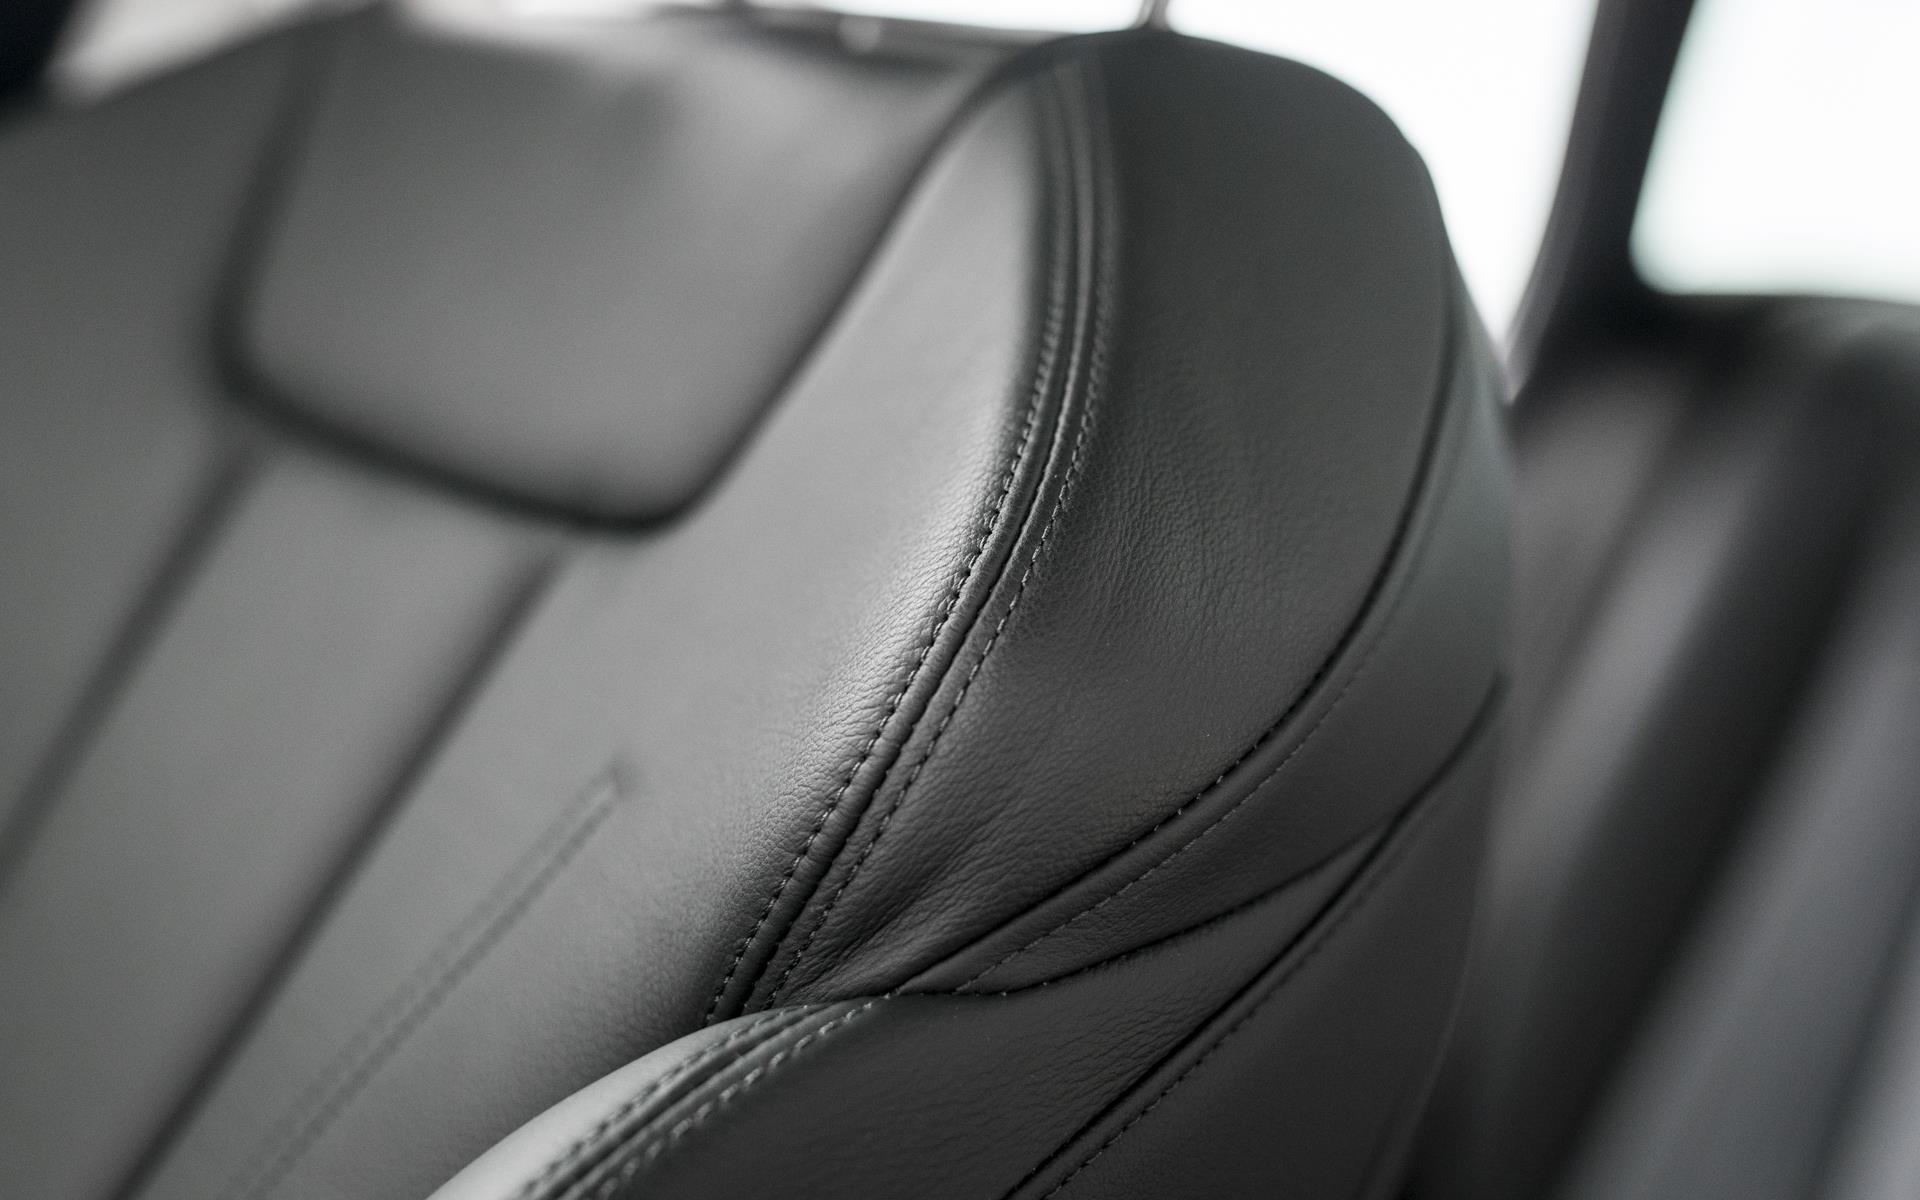 40 Avant 2,0 TDI Quattro S-Tronic 190HK Stc  image12